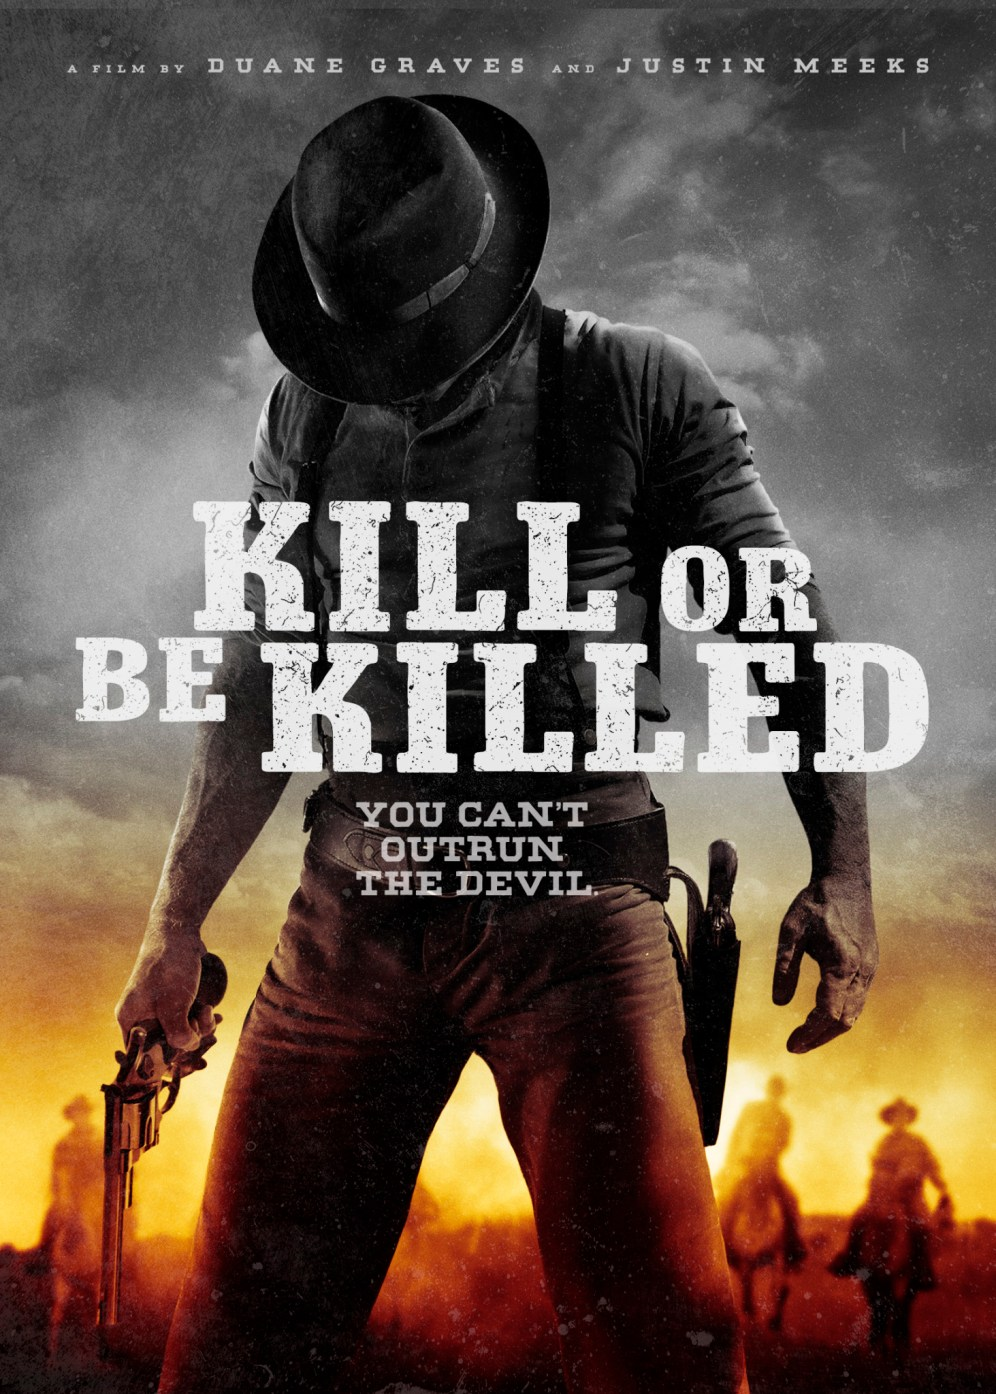 KILL OR BE KILLED poster exclusive   via RLJ Entertainment